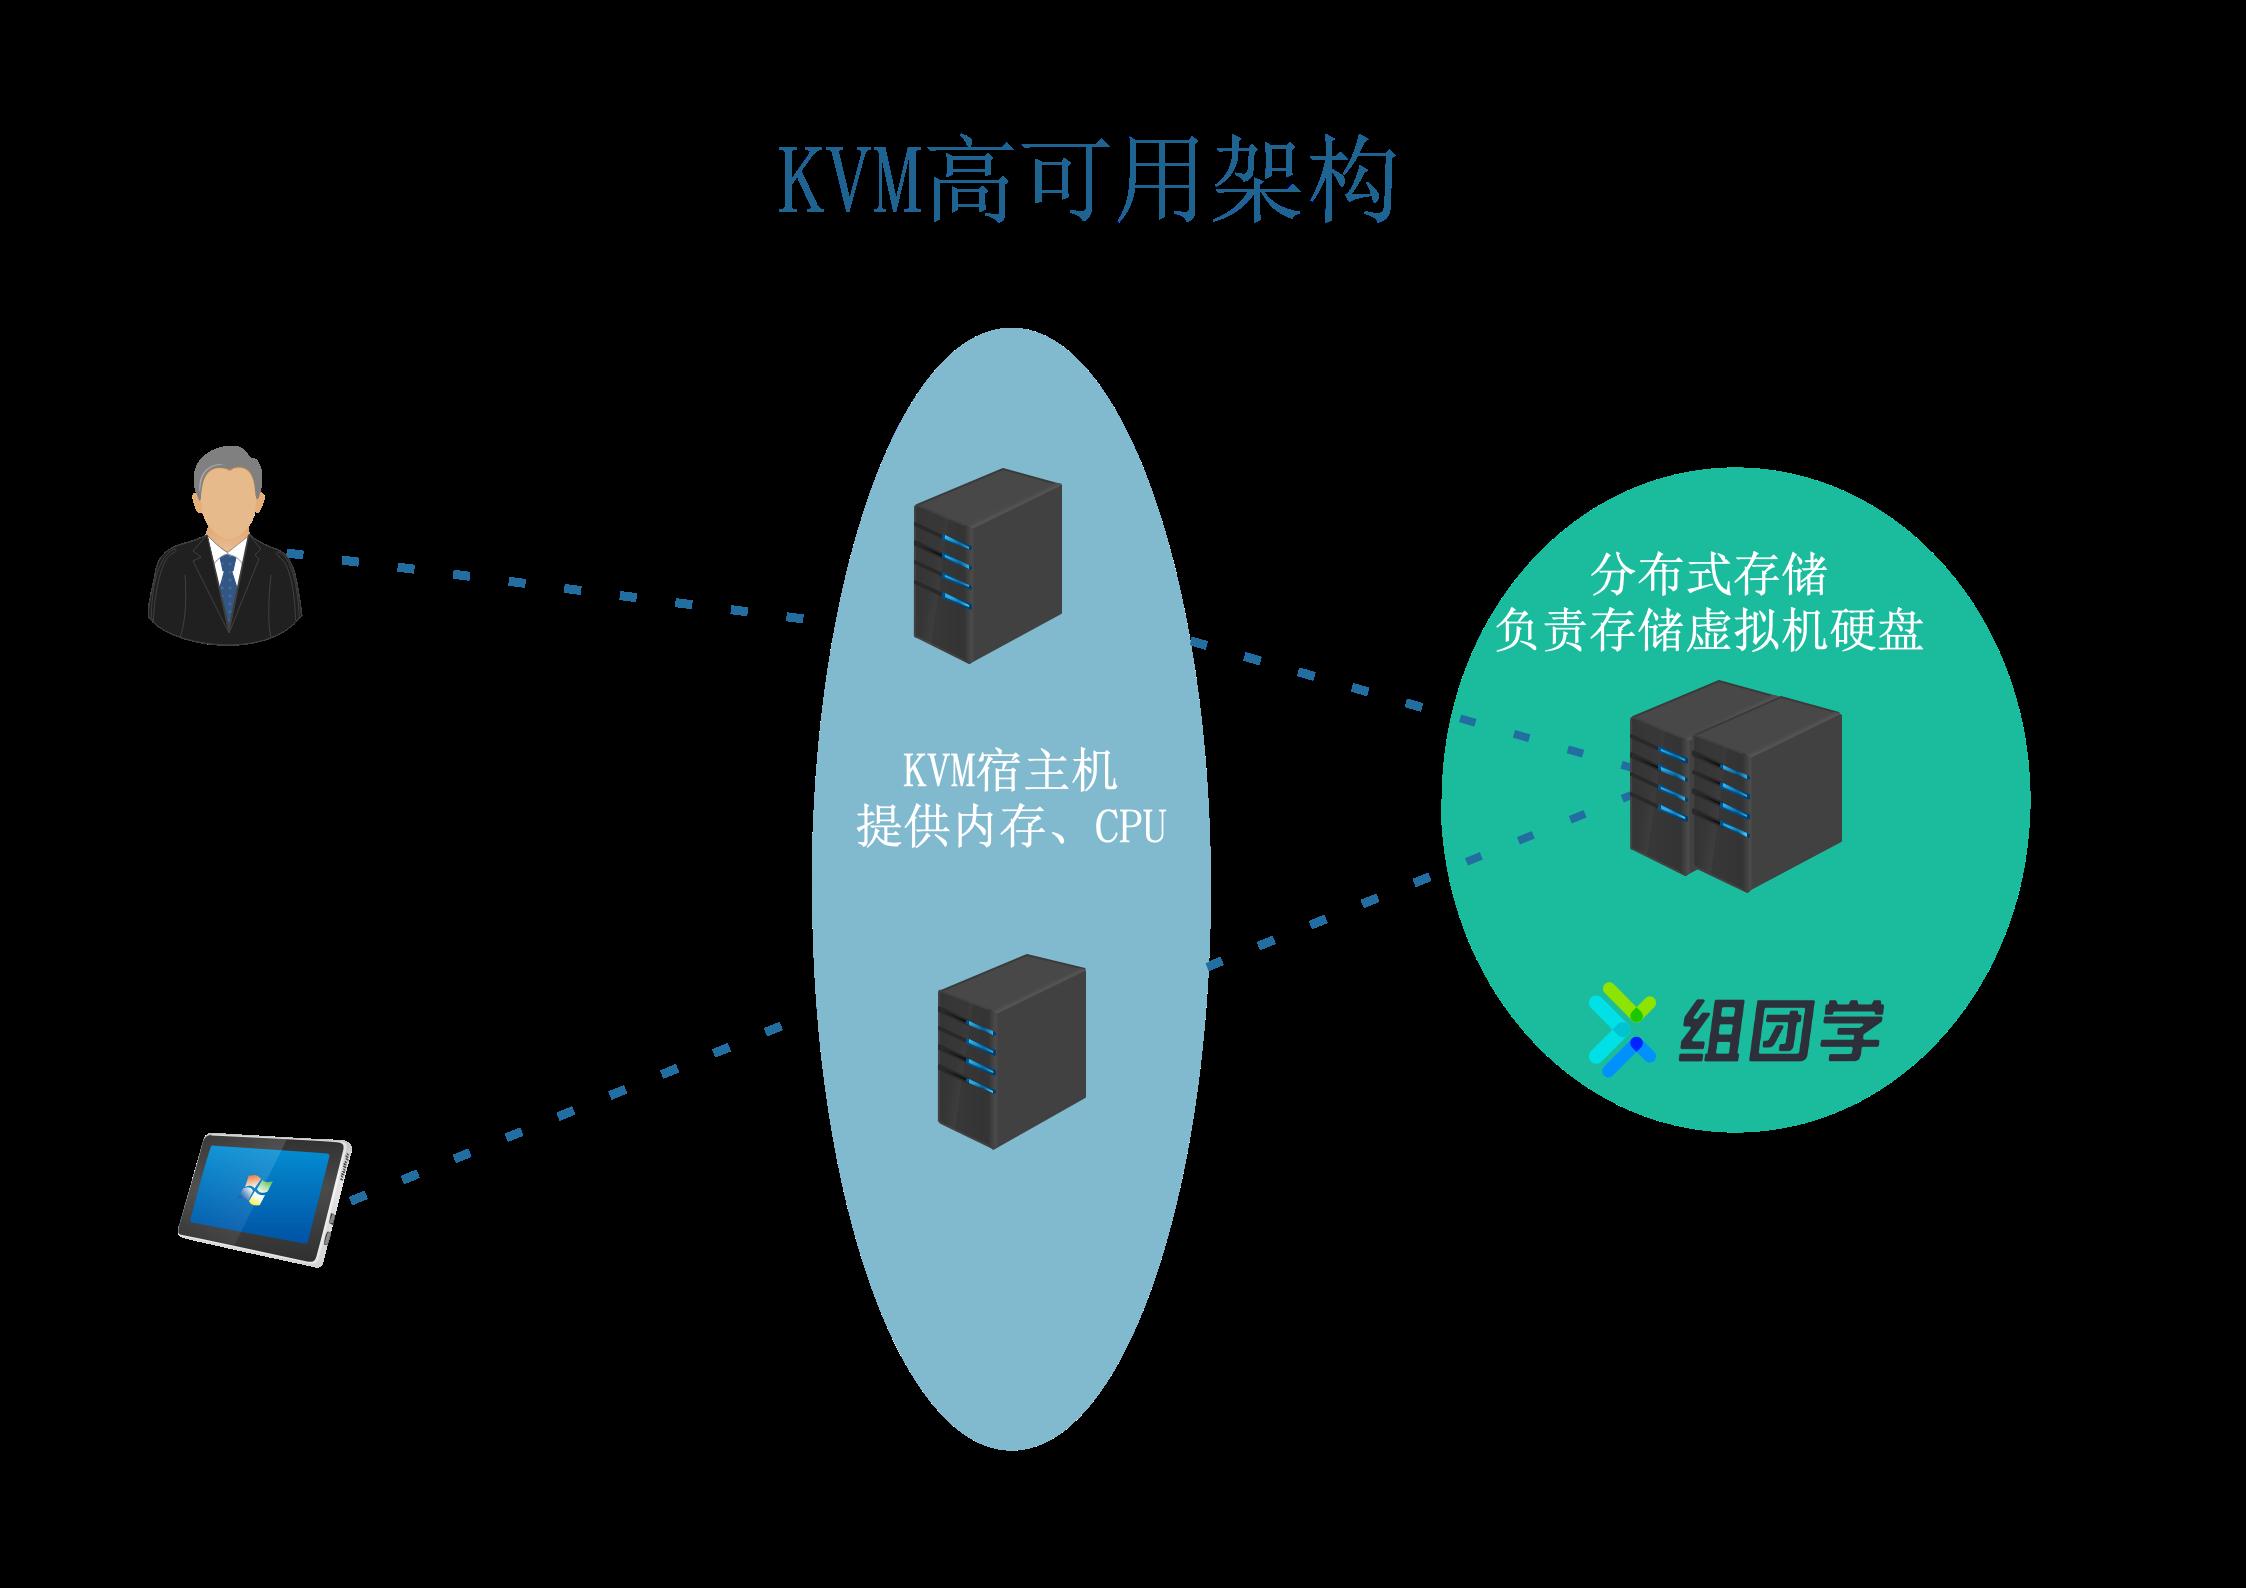 KVM虚拟机容灾架构.png